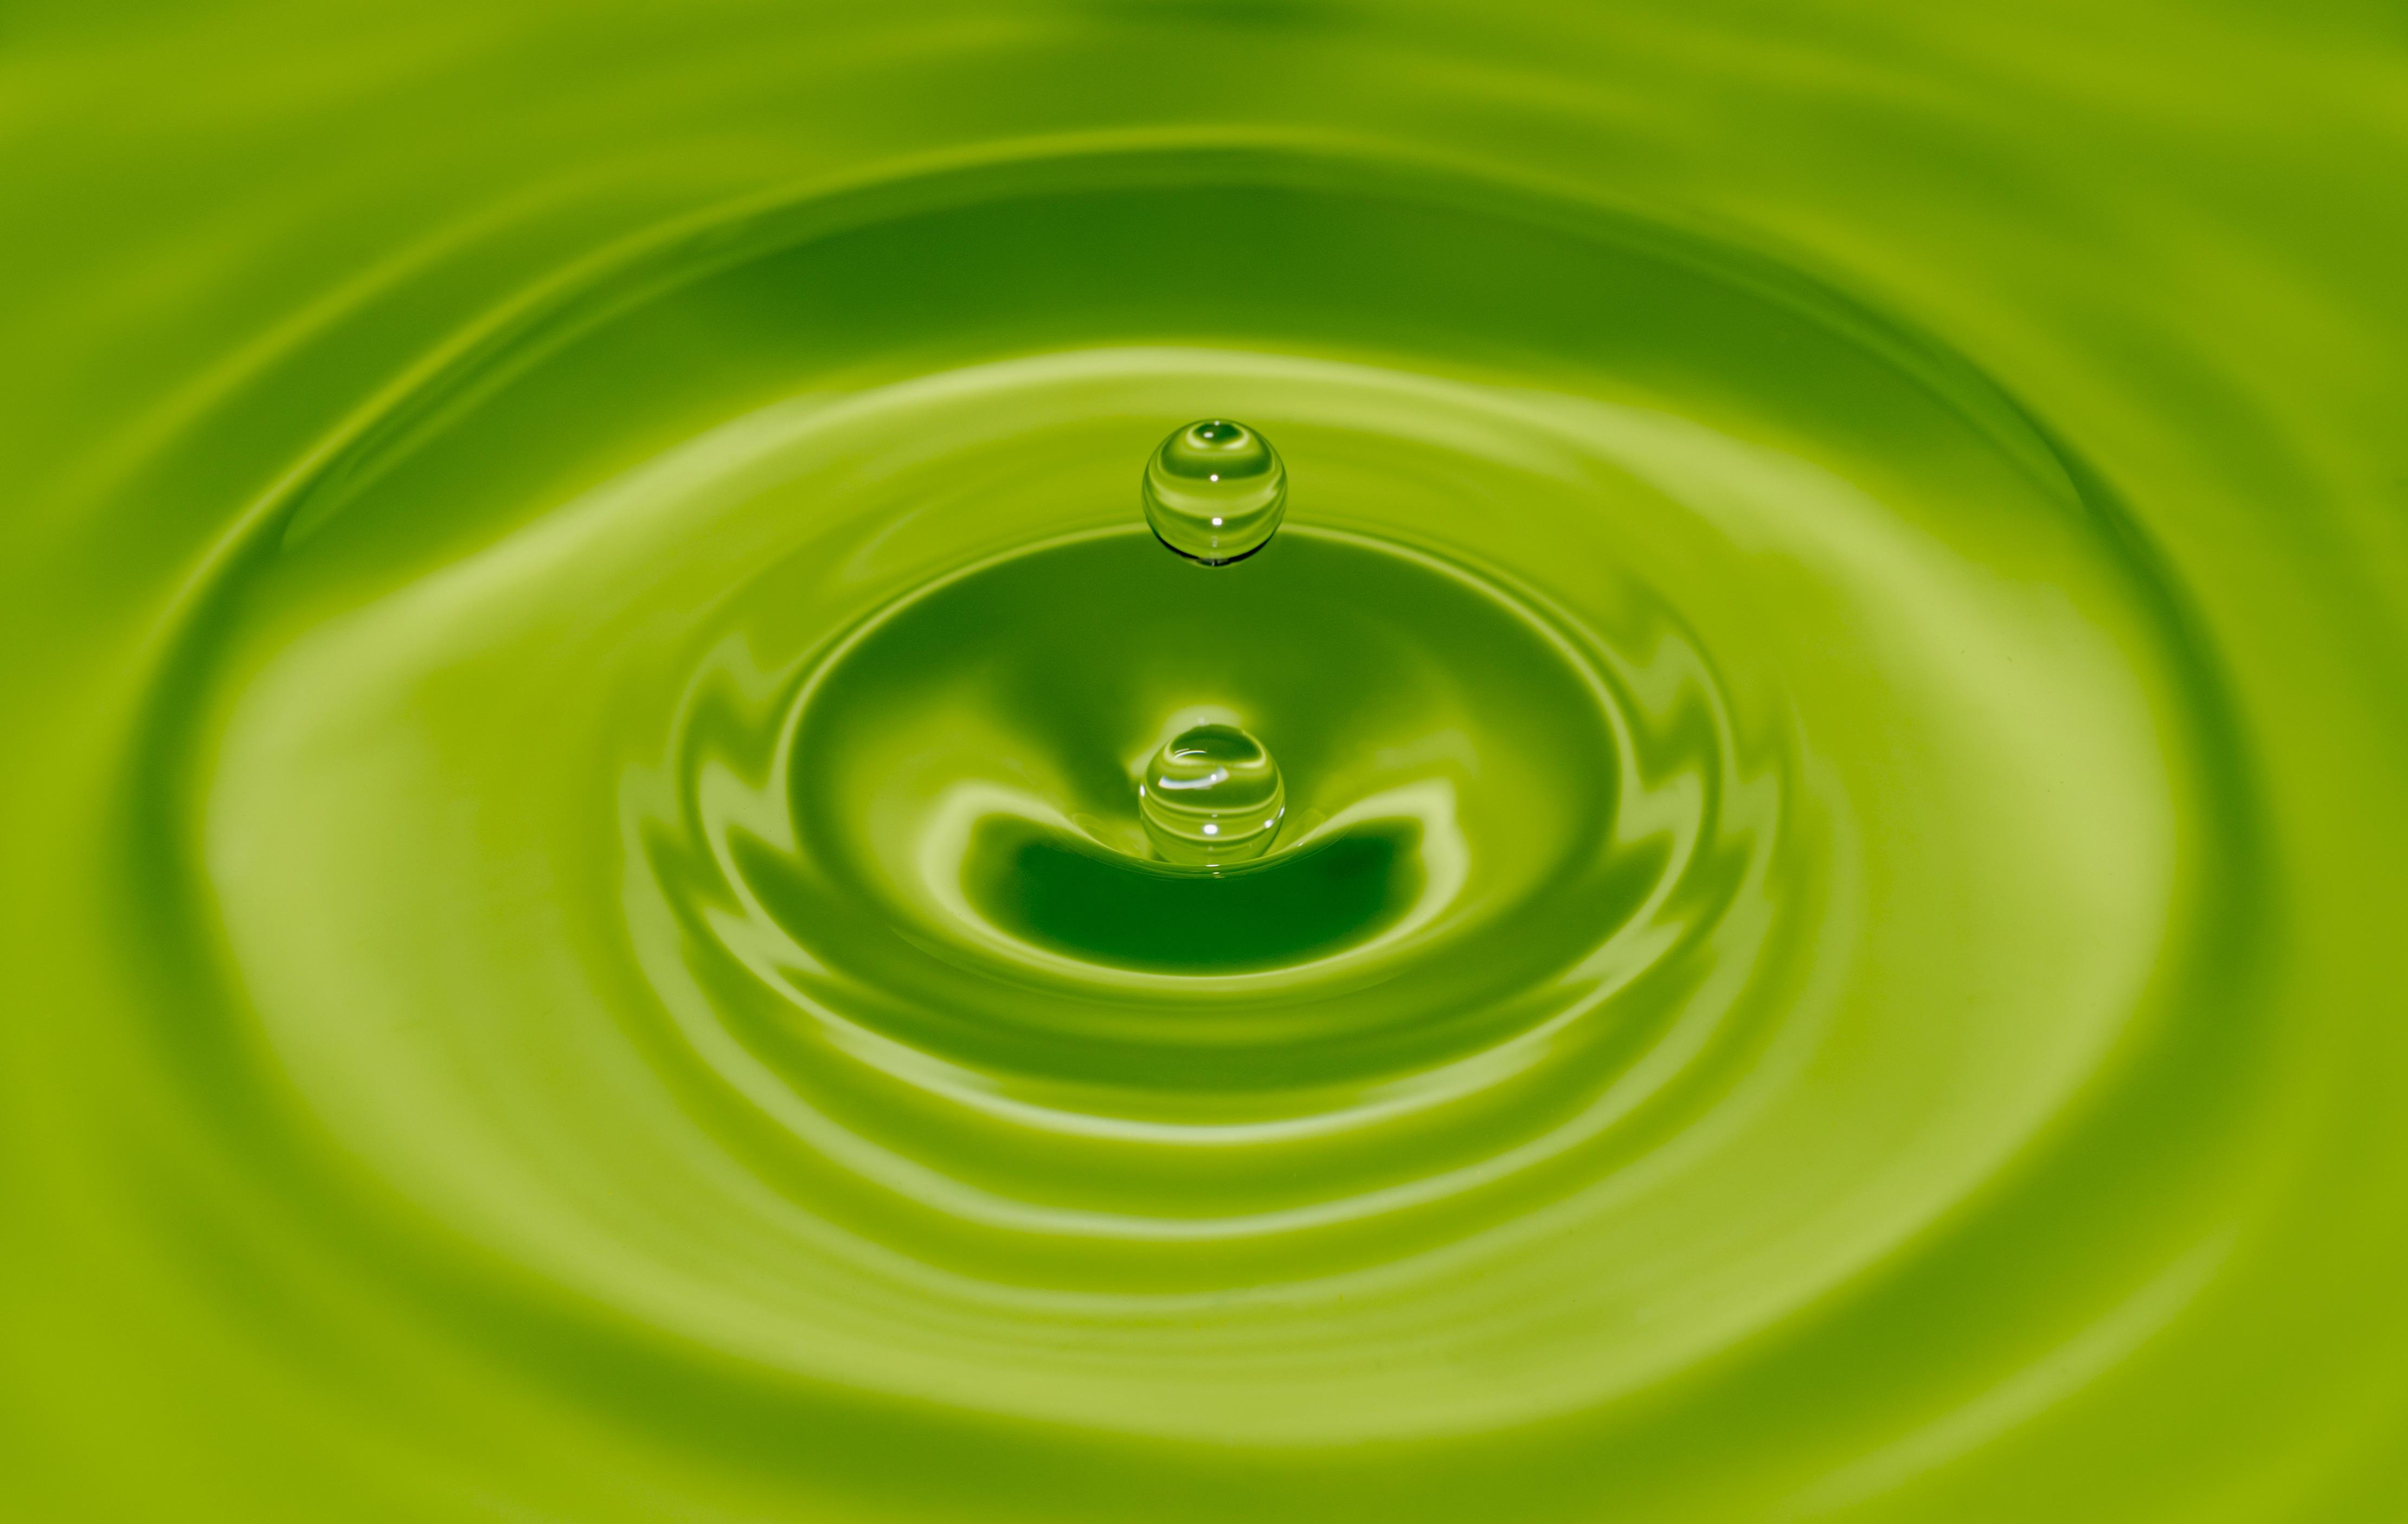 Gambar Penurunan Embun Cair Tekstur Hujan Tetesan Air